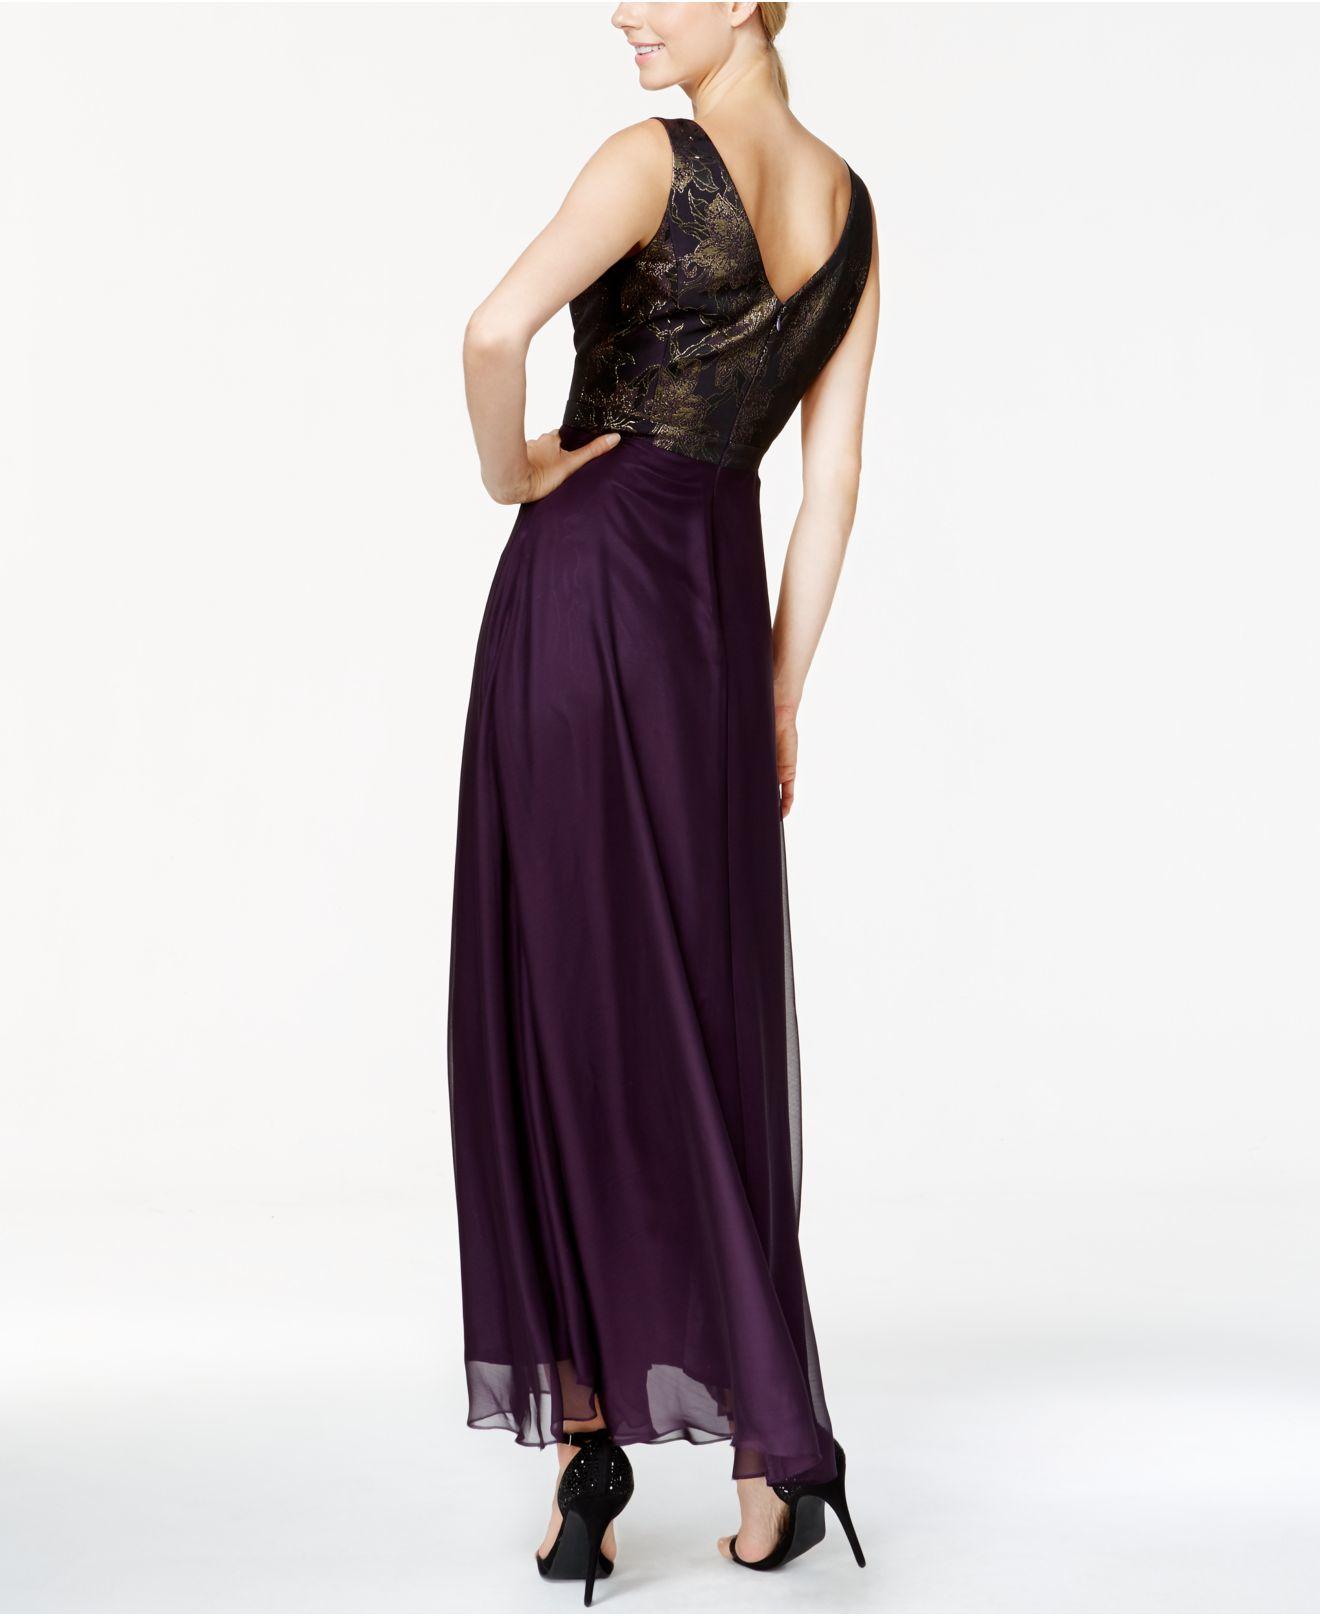 9a61e2ffe9 Lyst - Tahari Metallic-print Gown And Jacket in Purple